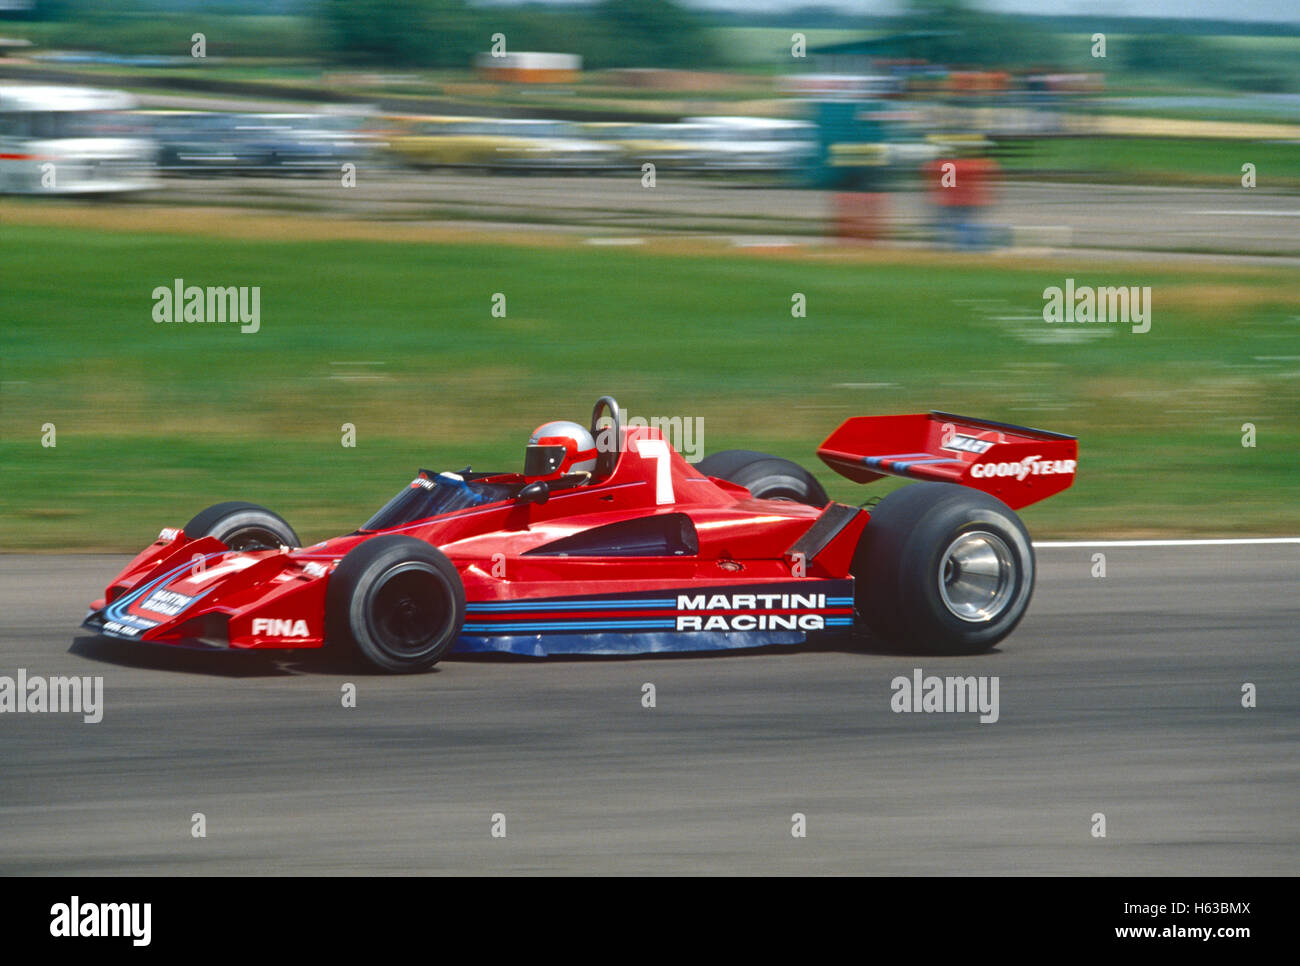 John Watson driving Brabham BT45 Alfa Romeo racing car in 1978 - Stock Image